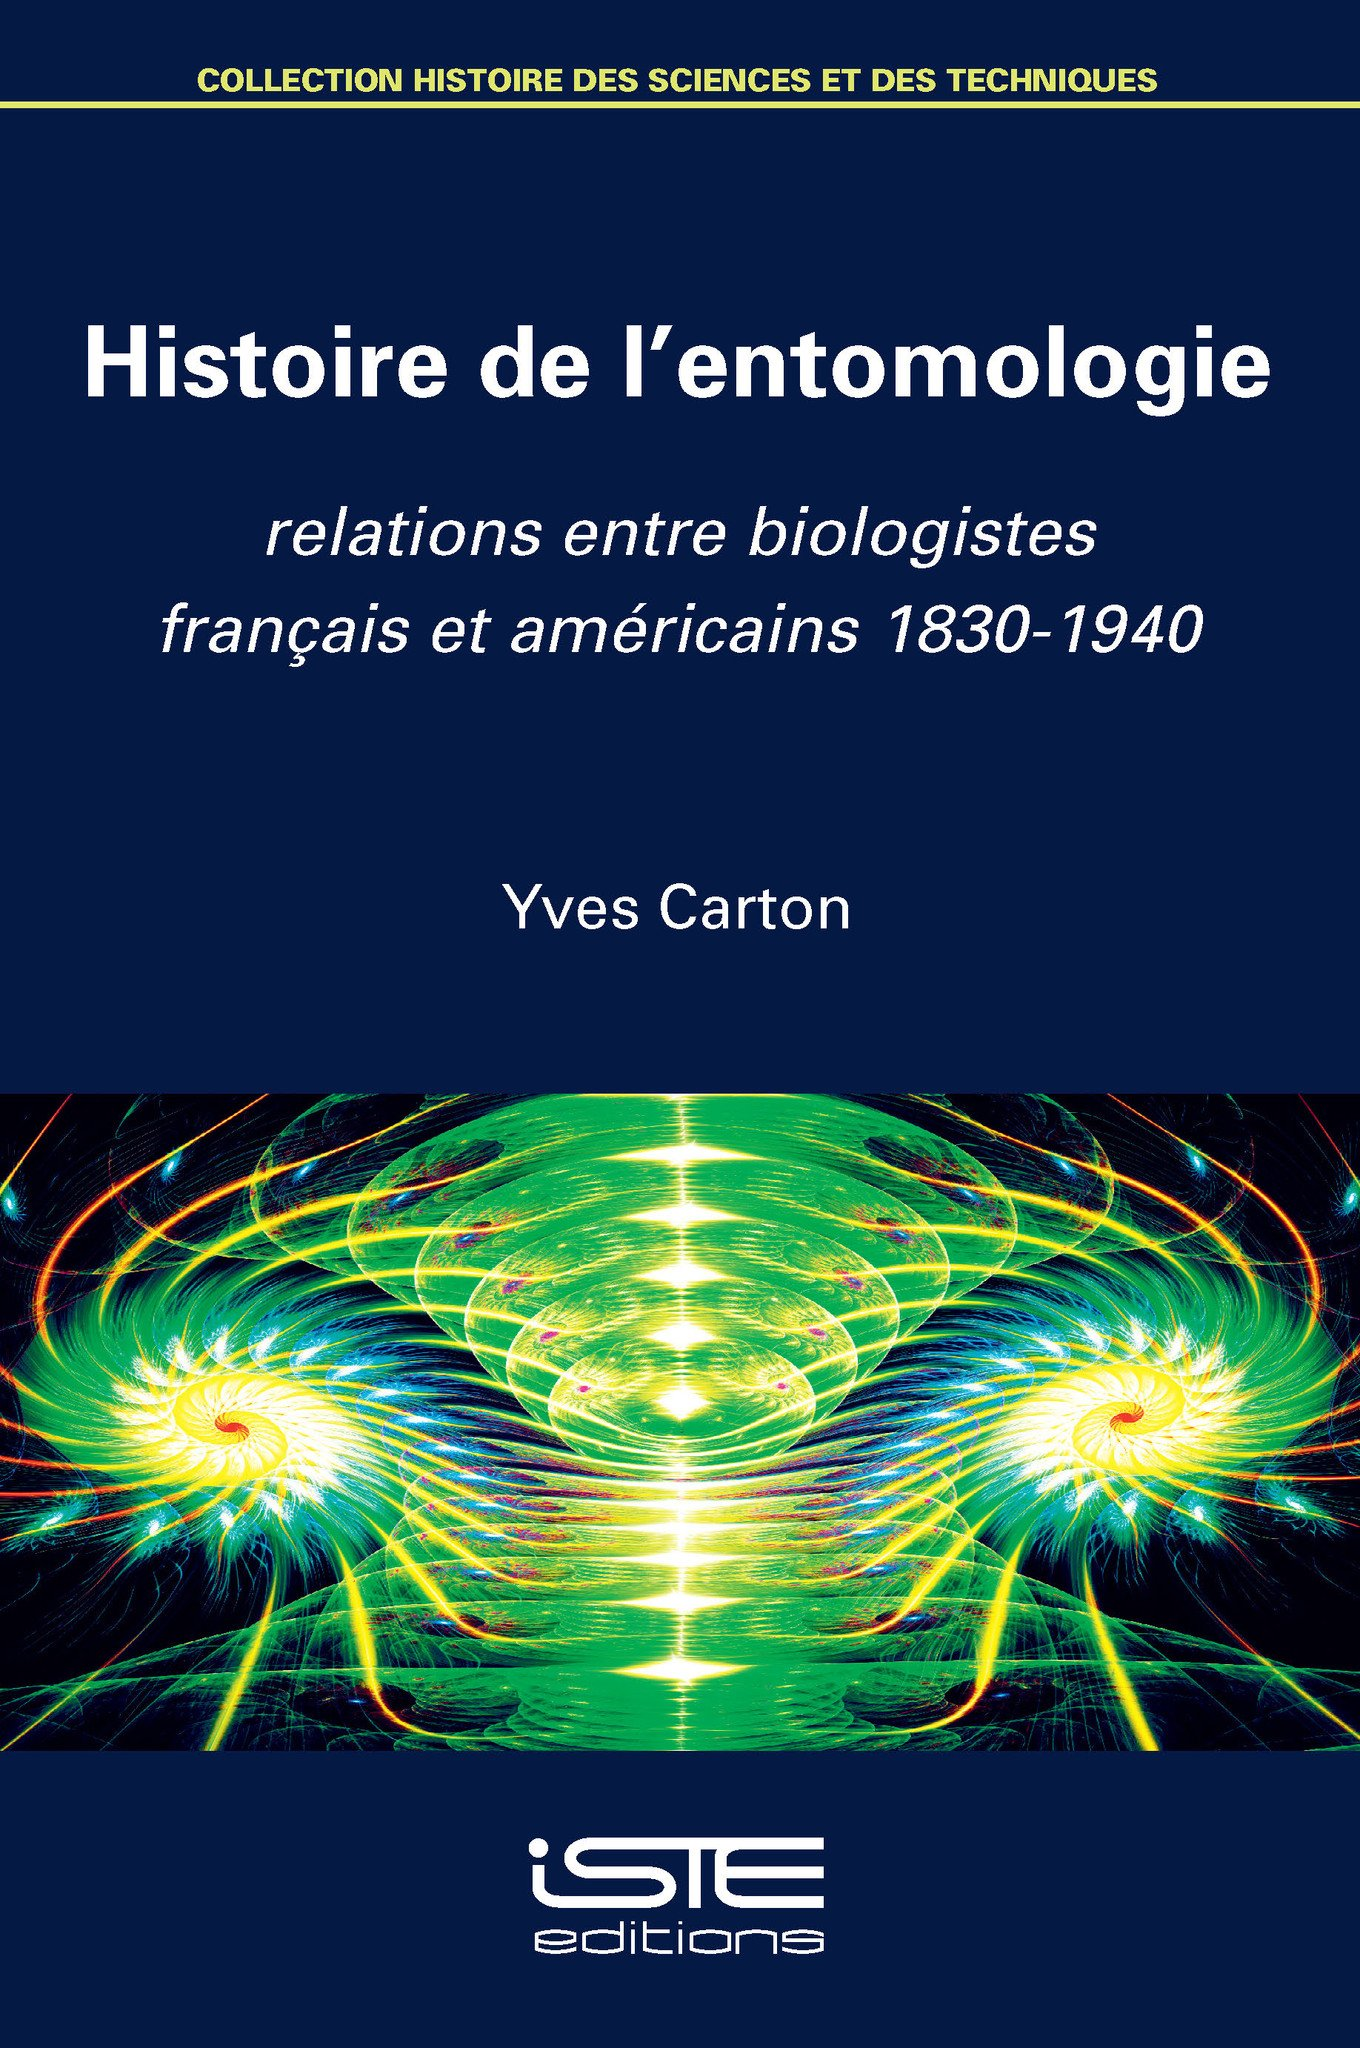 Histoire de l'entomologie